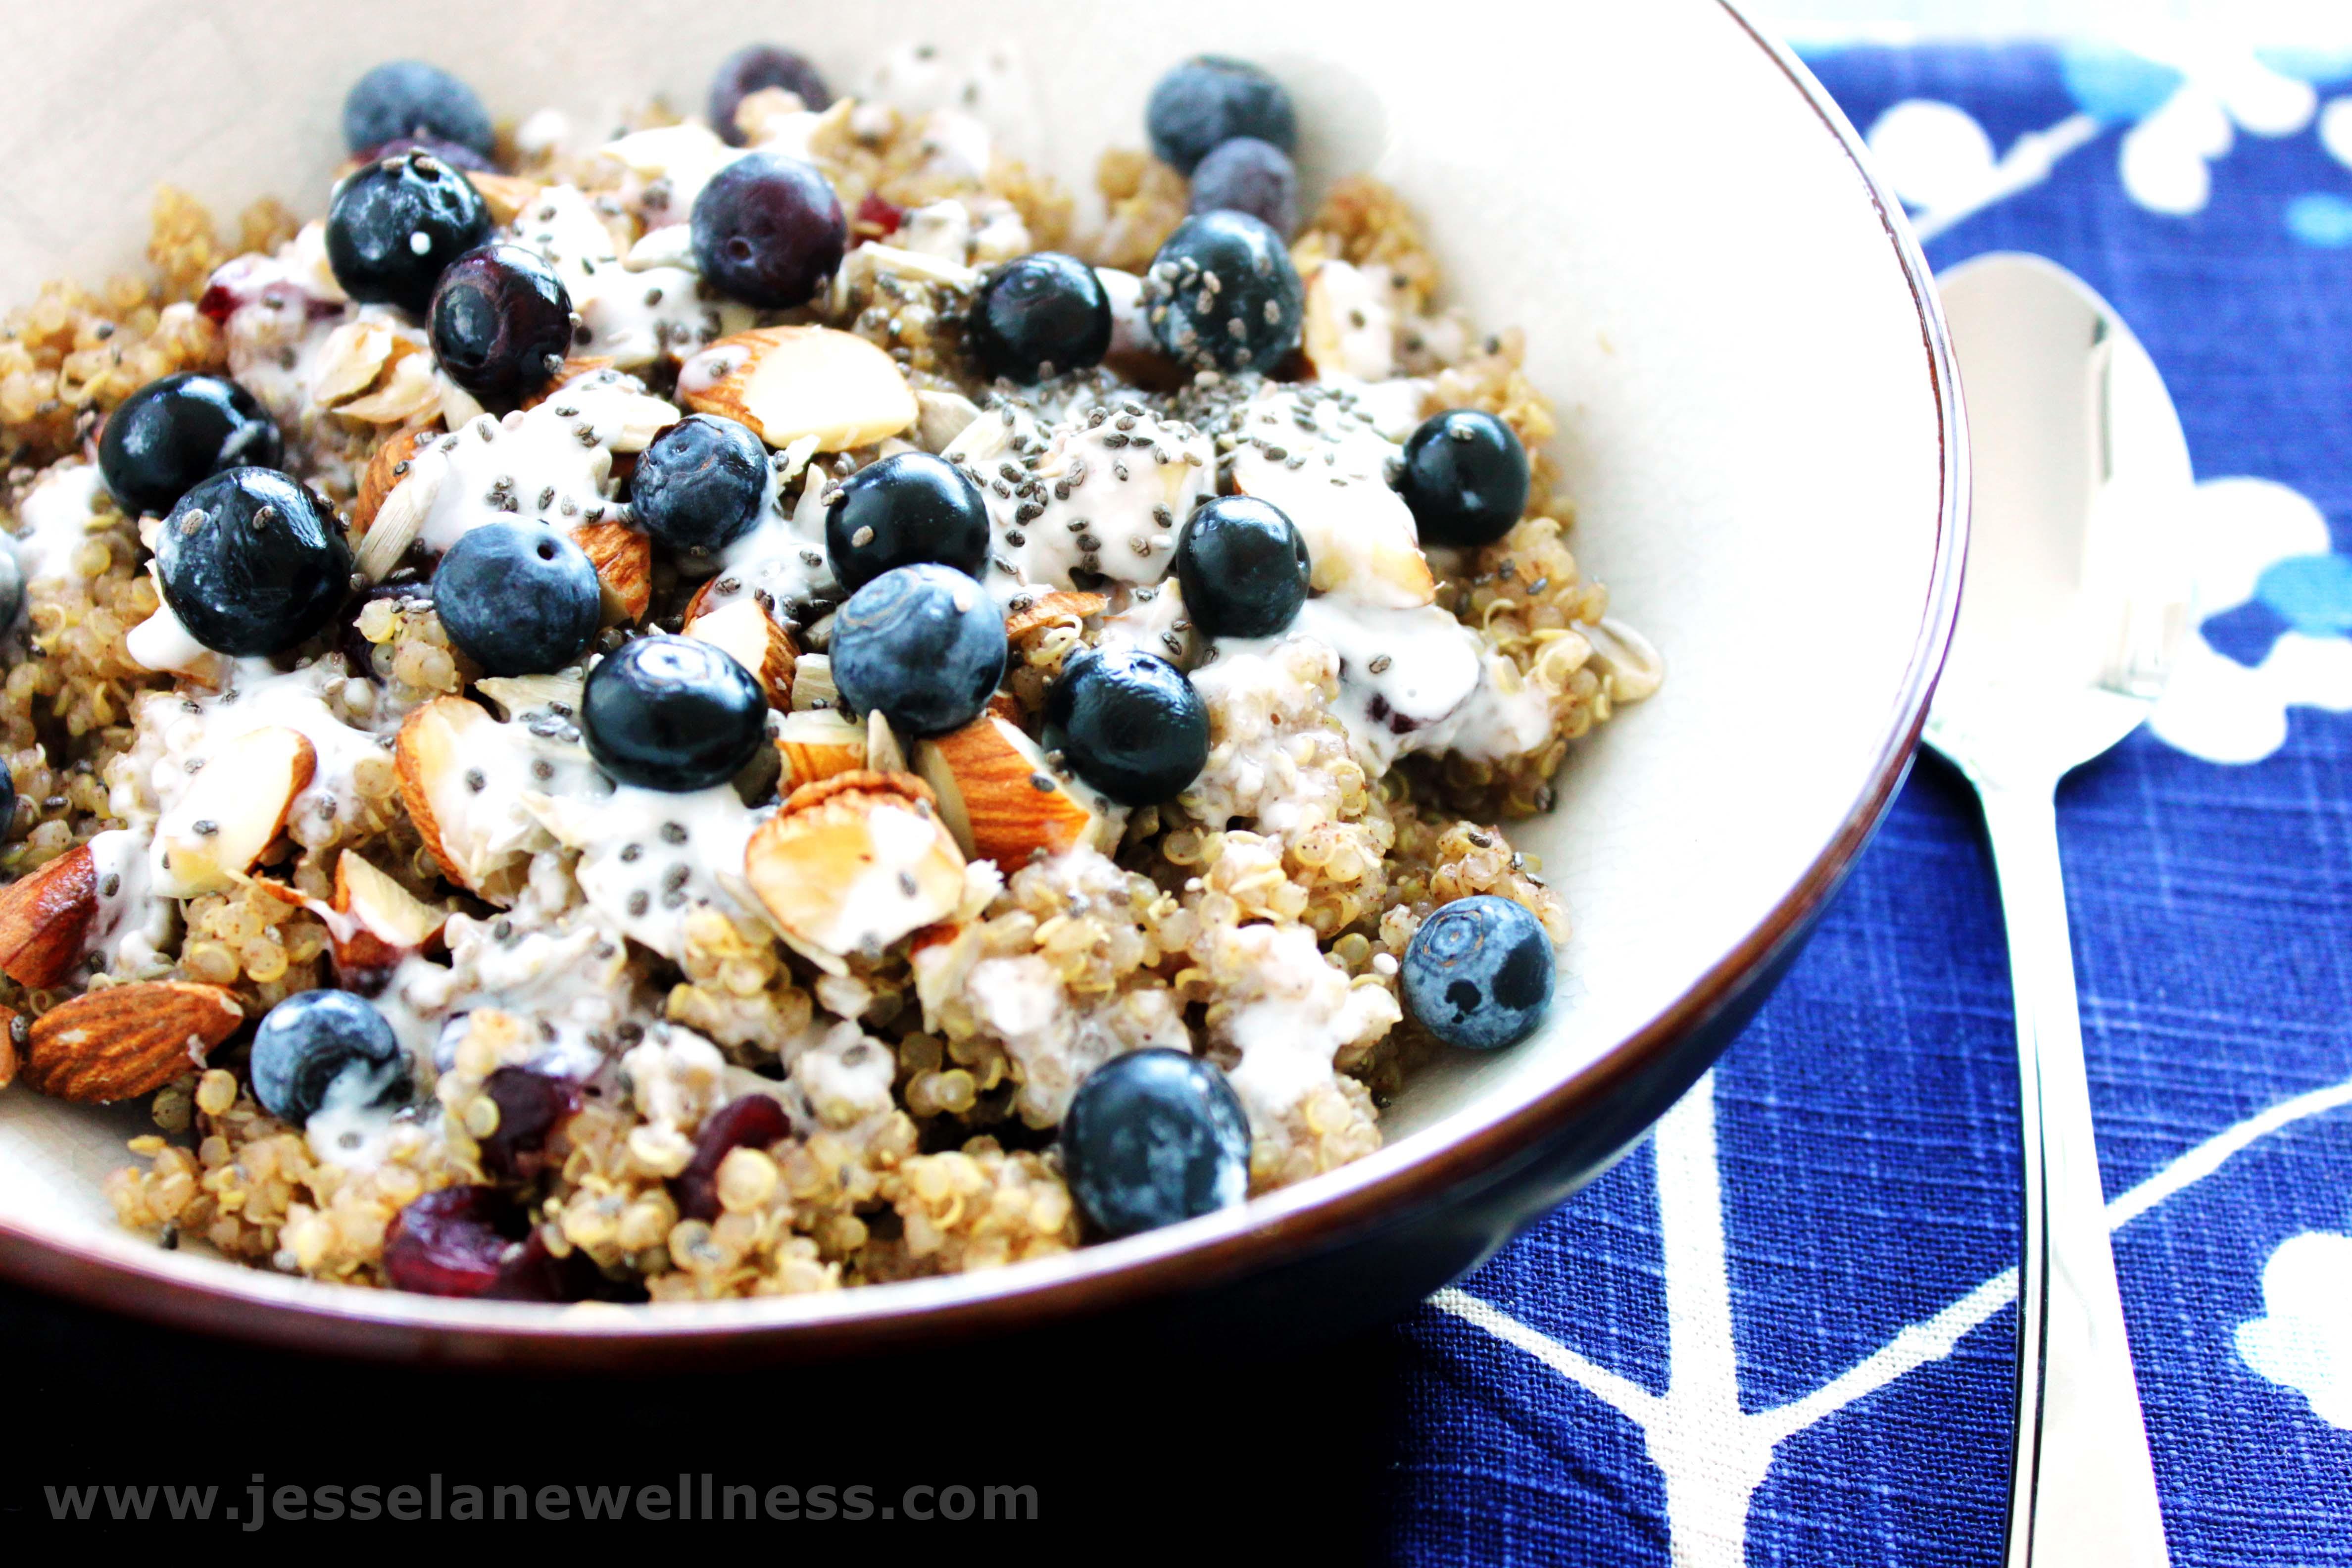 Quinoa For Breakfast  Breakfast Quinoa Vegan and Gluten Free by Jesse Lane